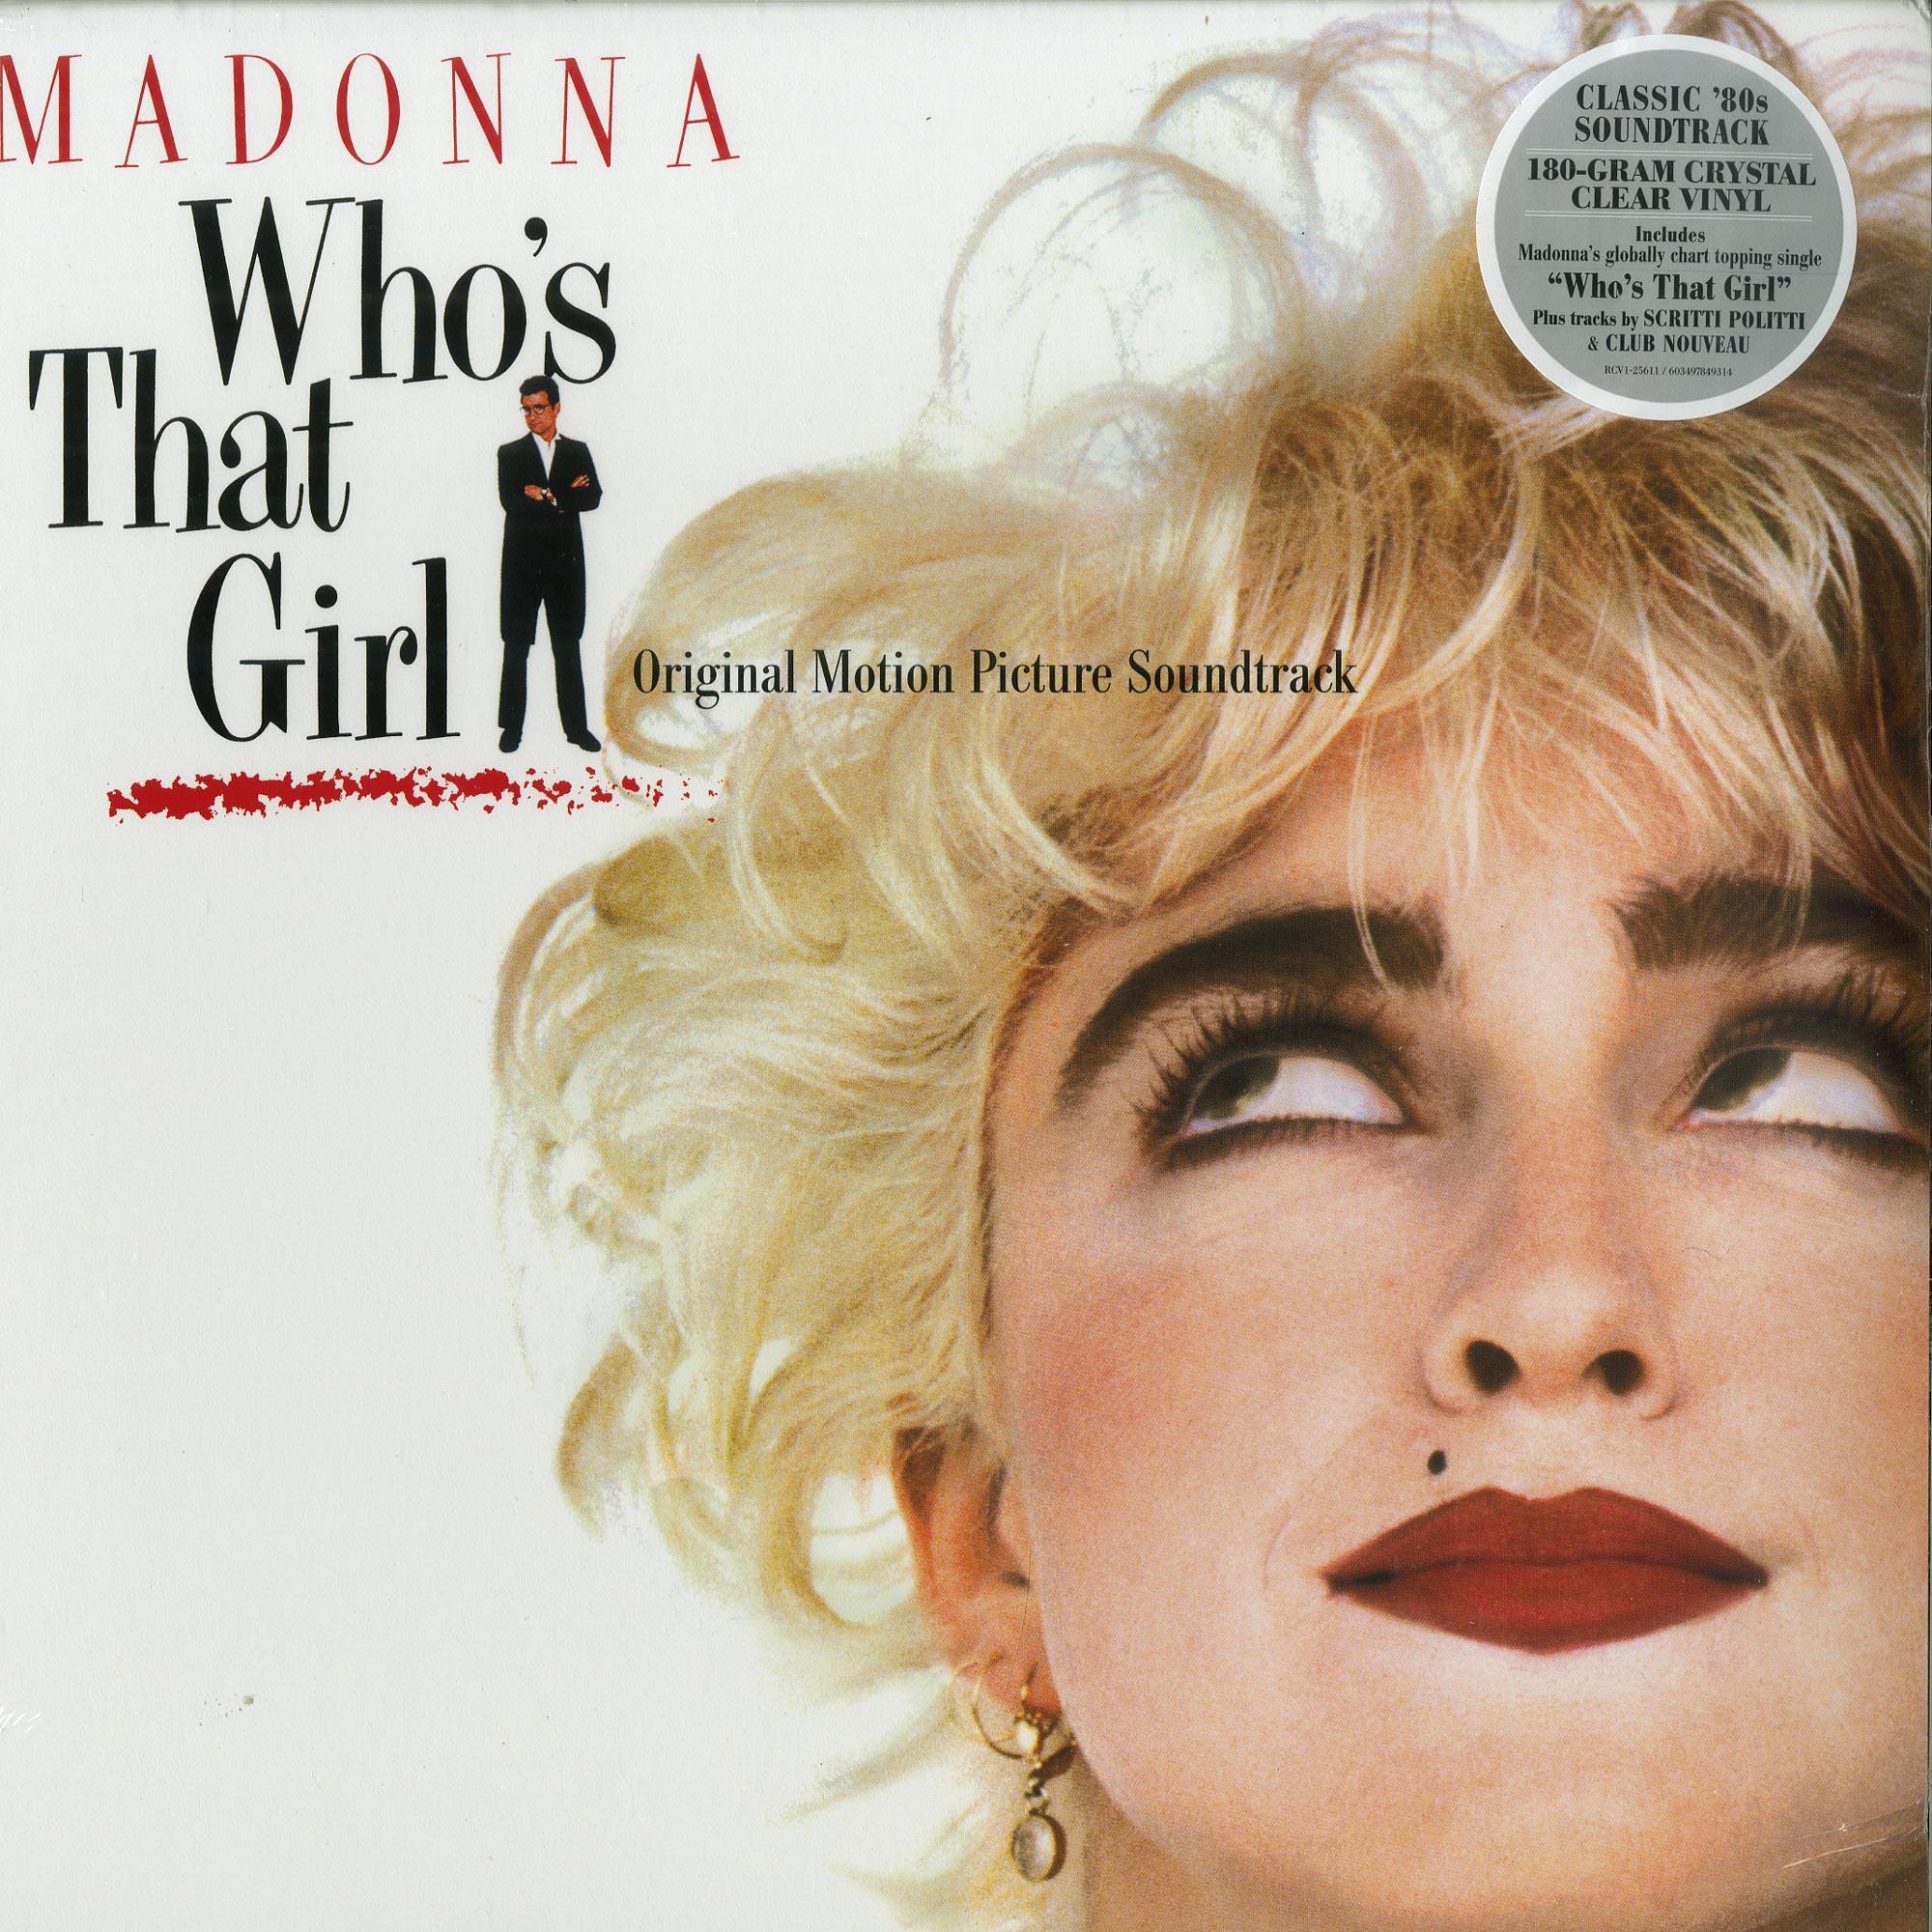 Madonna / Original Sound Track - WHOS THAT GIRL